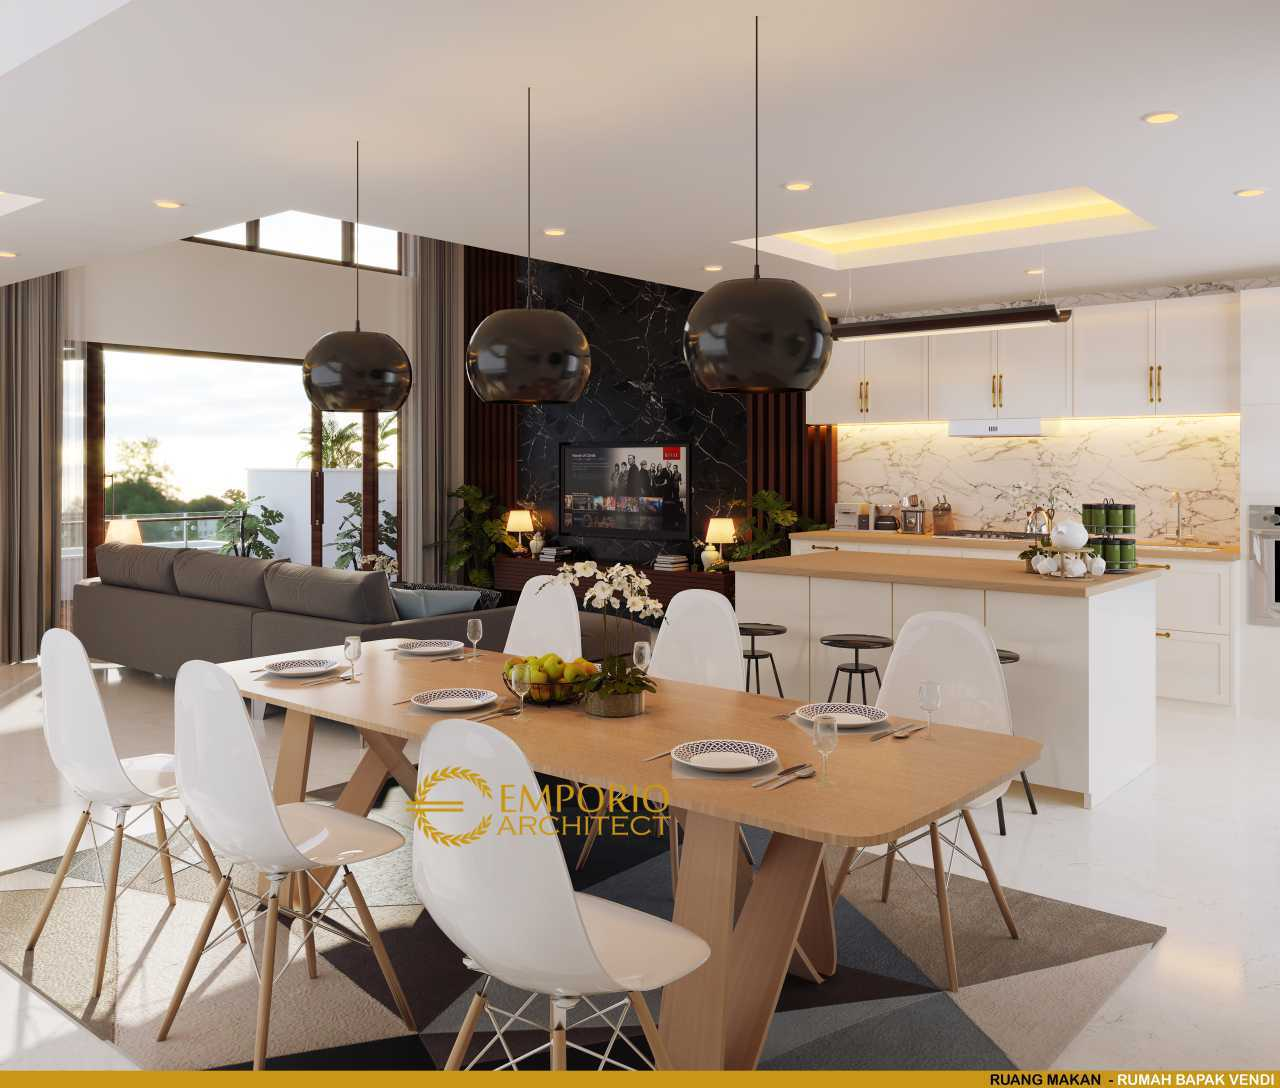 Emporio Architect Jasa Arsitek Badung Desain Rumah Modern 2 Lantai 726 @ Petitenget, Badung, Bali Kabupaten Badung, Bali, Indonesia Kabupaten Badung, Bali, Indonesia Emporio-Architect-Jasa-Arsitek-Badung-Desain-Rumah-Modern-2-Lantai-726-Petitenget-Badung-Bali  93952